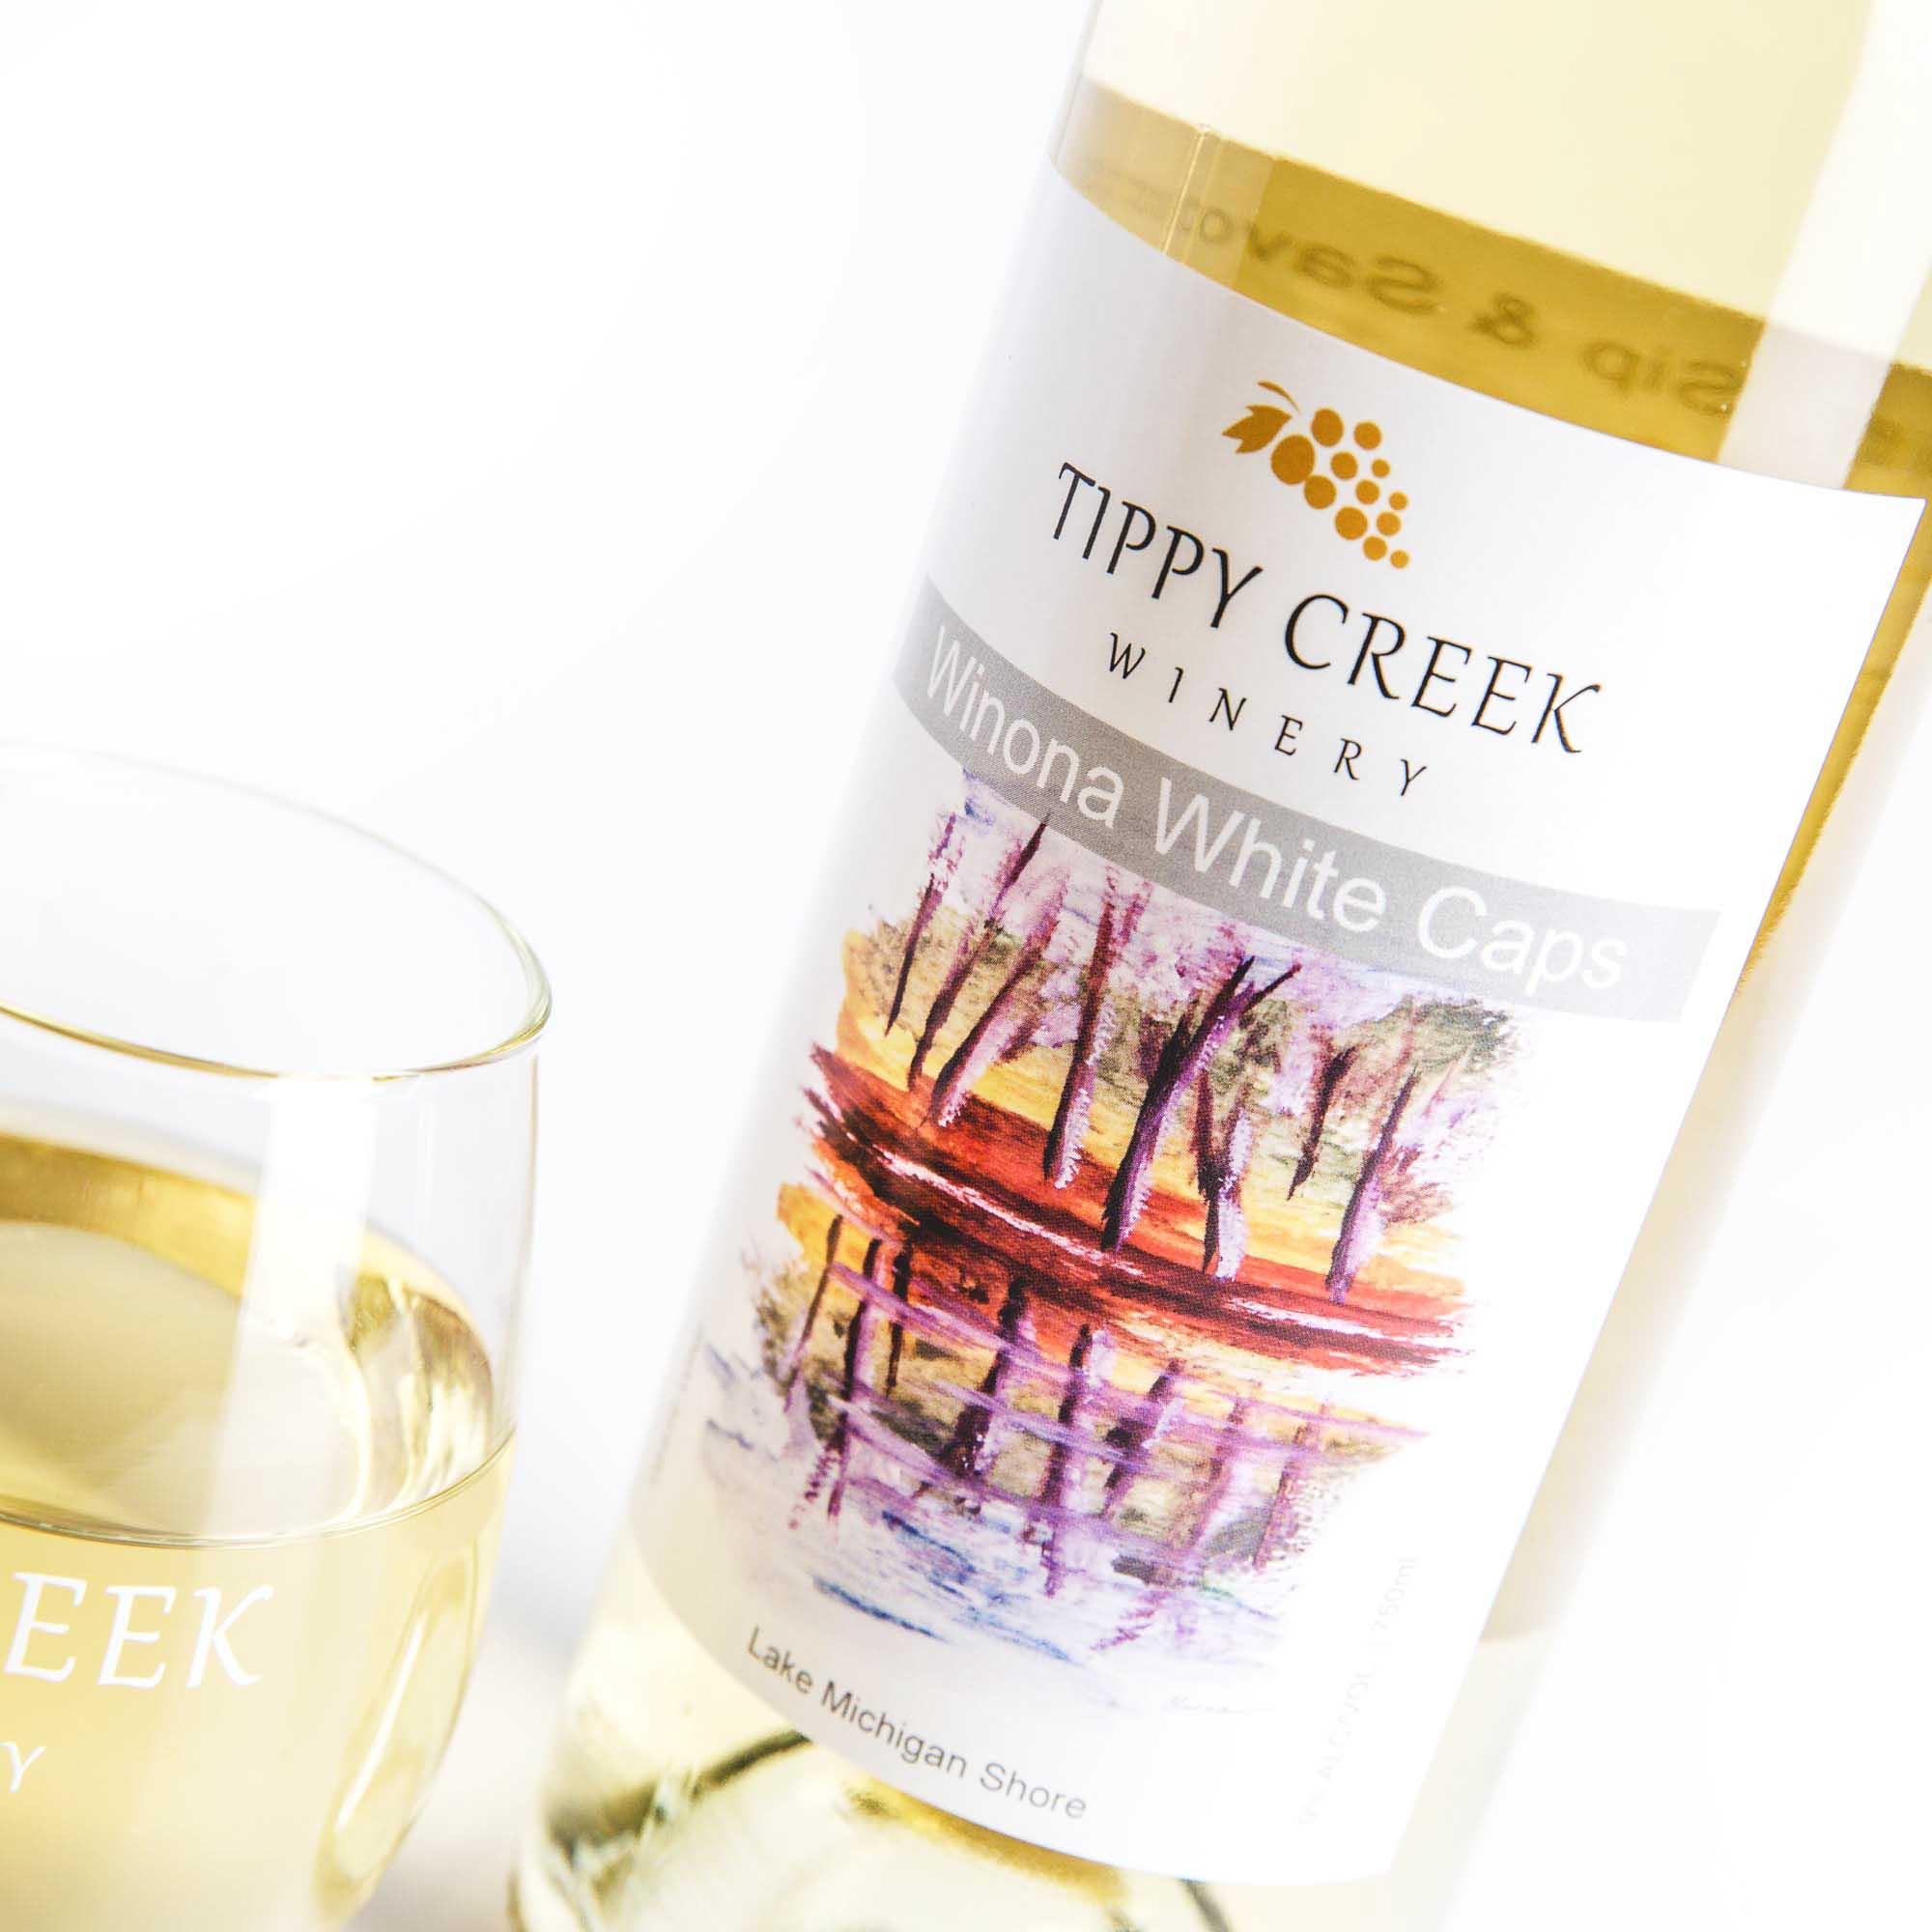 Winona White Caps. White Wine by Tippy Creek Winery.